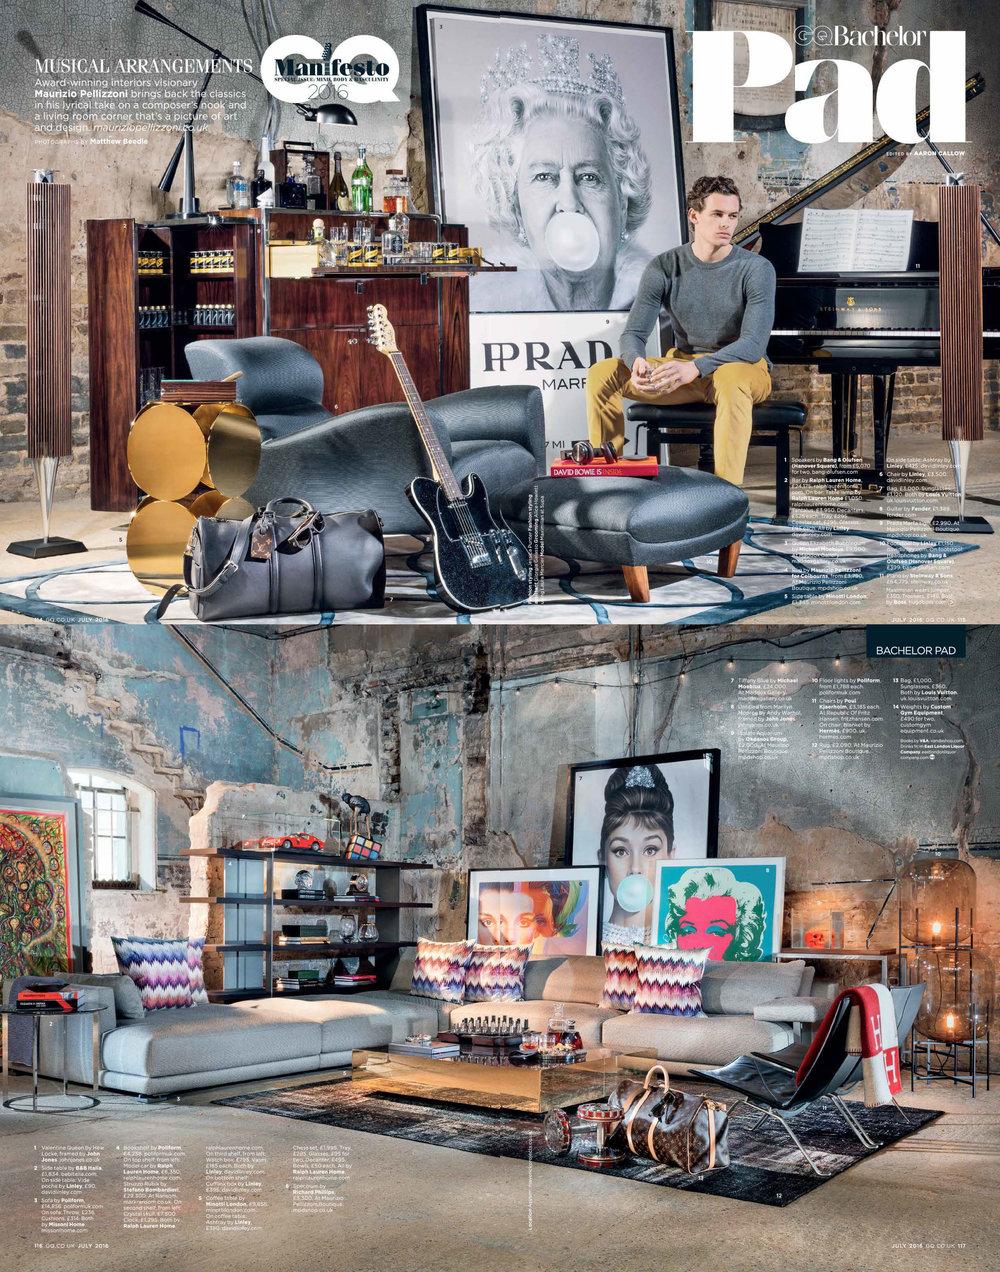 GQ Magazine - Stefano Bombardieri at Ransom Art